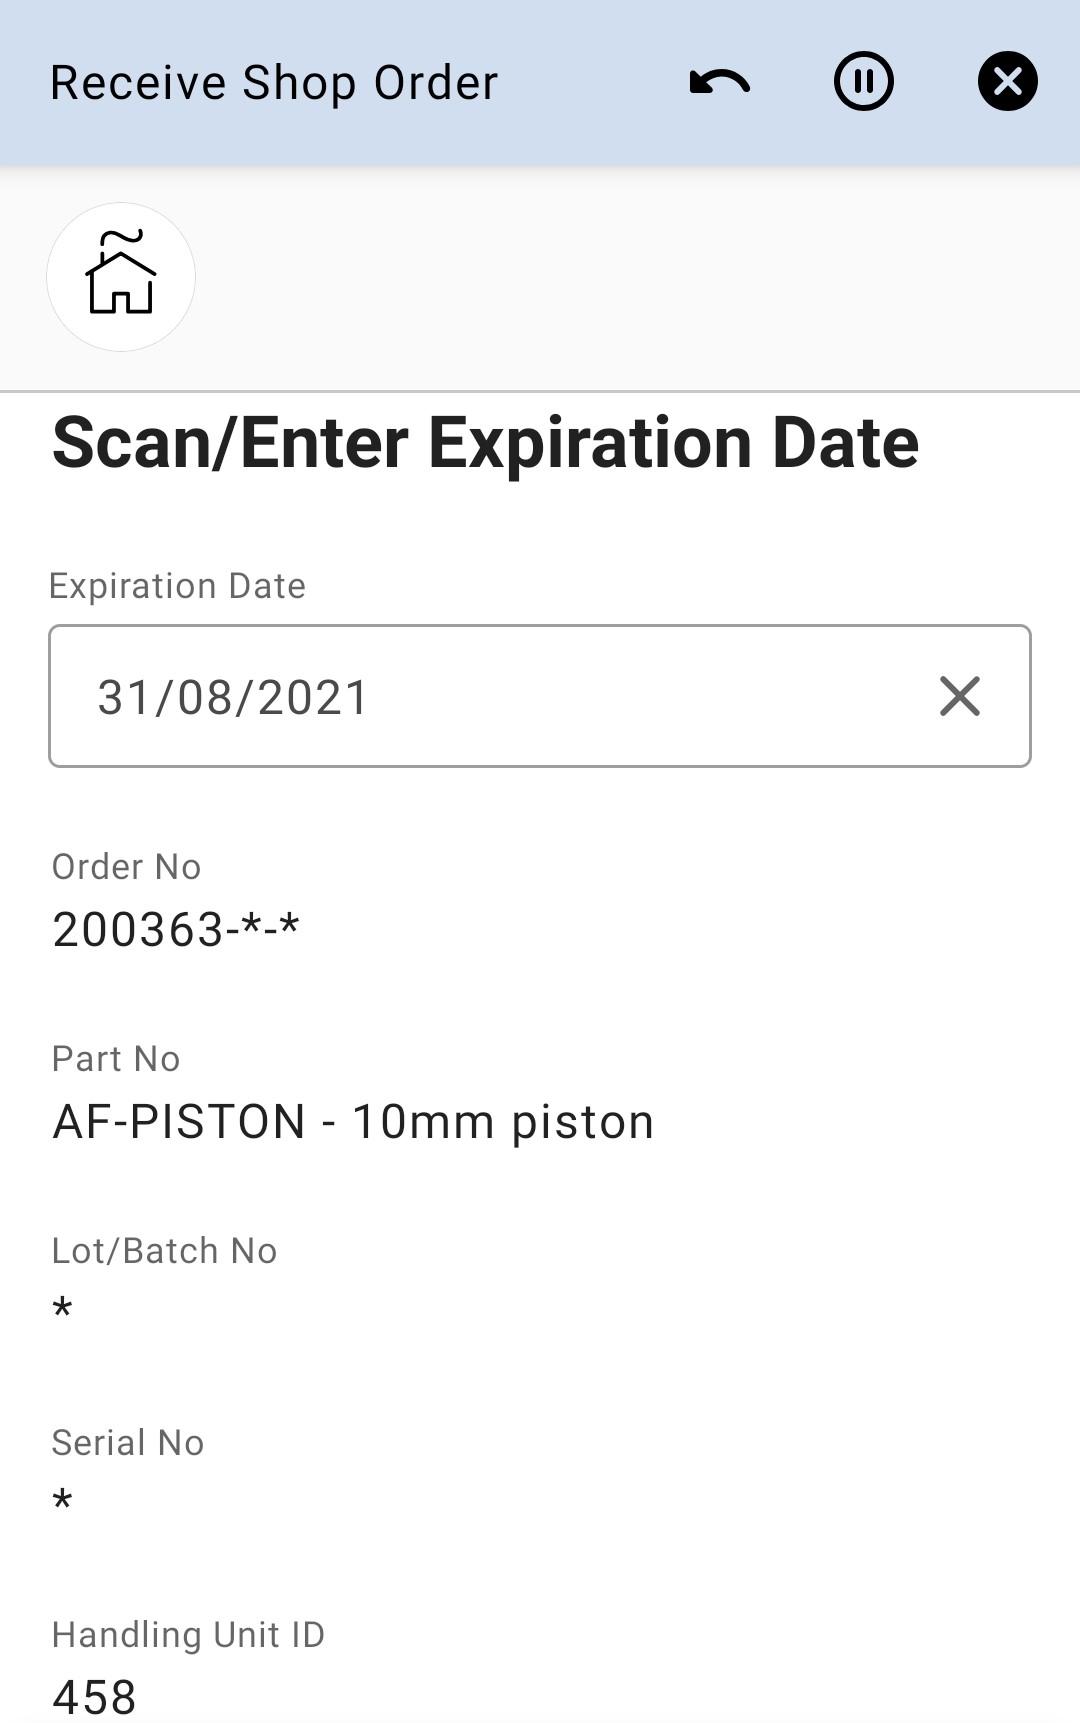 Enetr Expiration Date